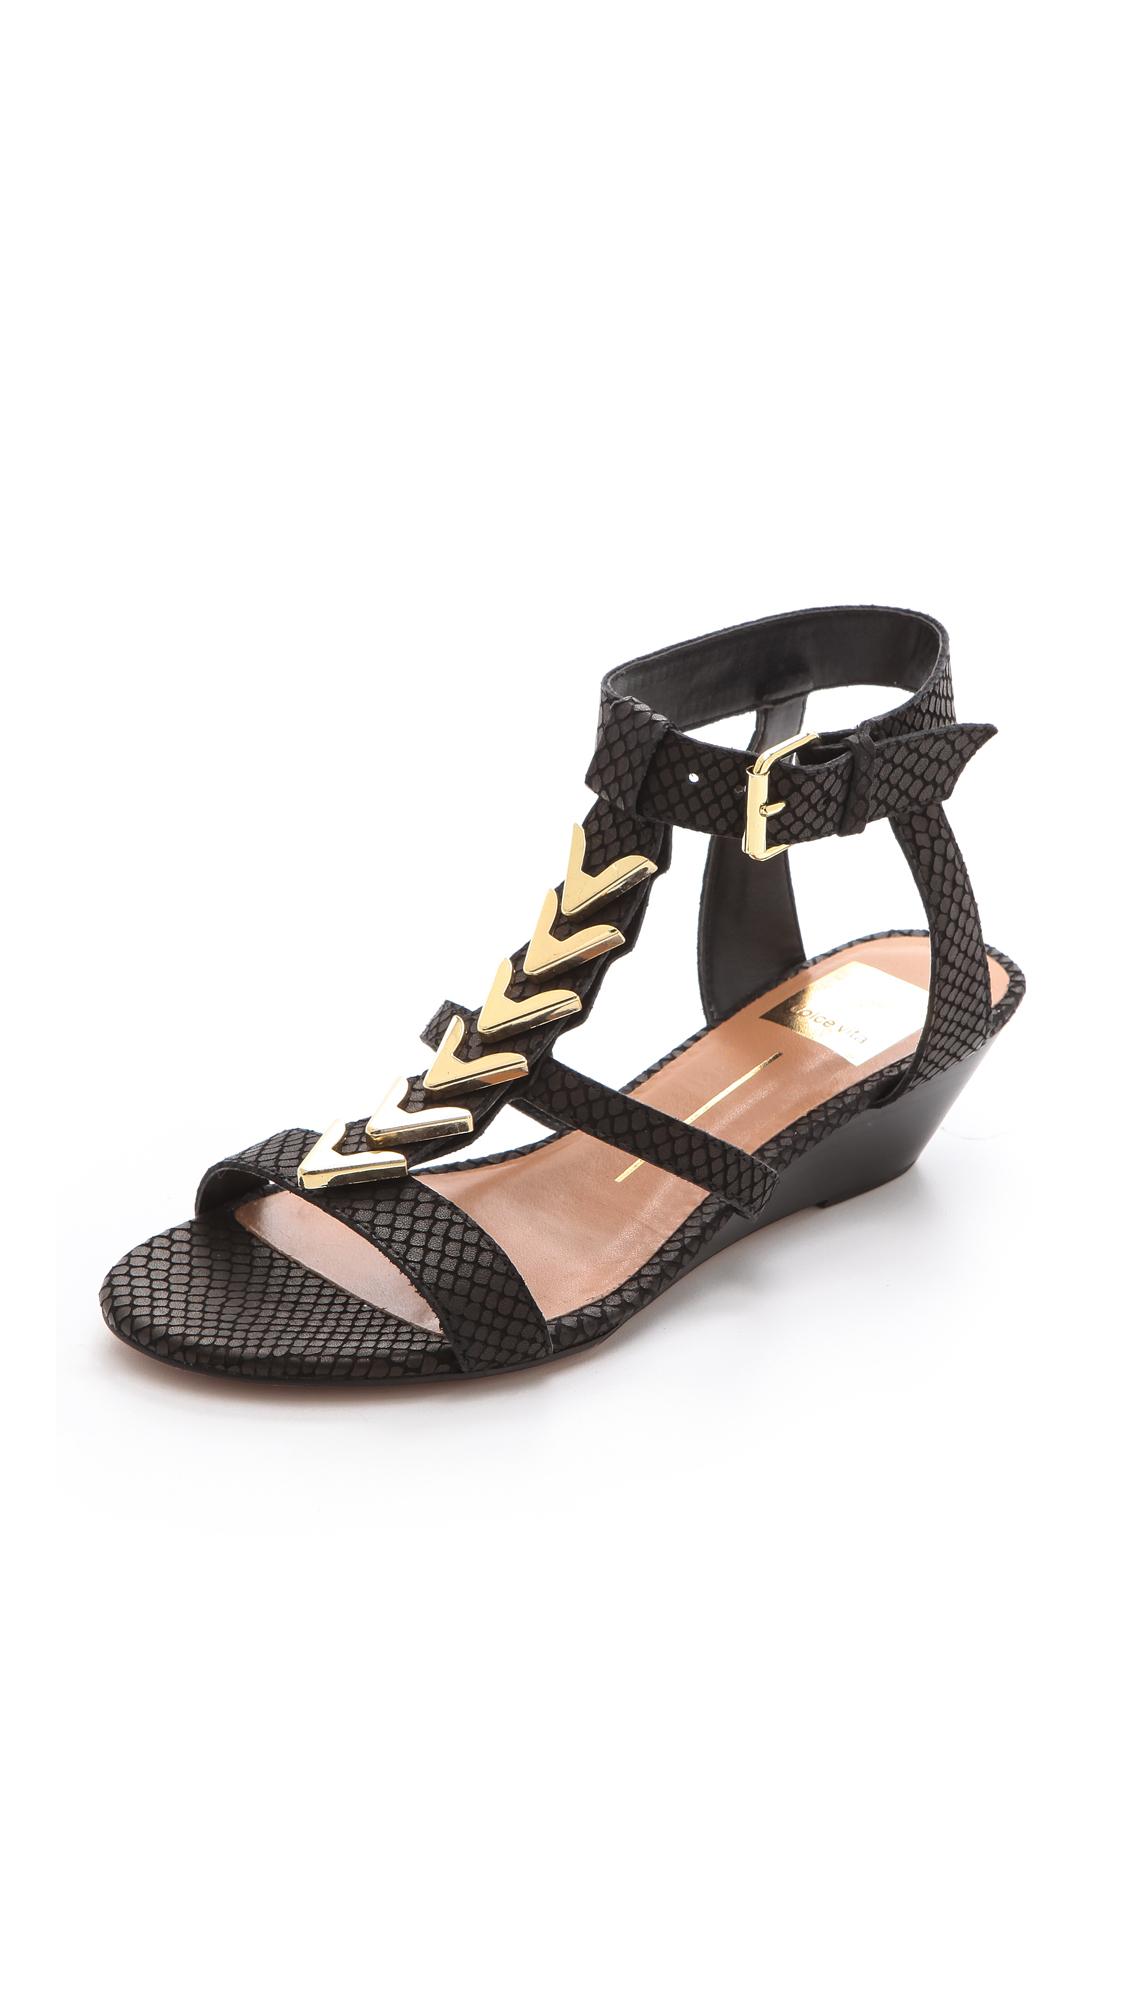 dolce vita helia low wedge sandals in black lyst